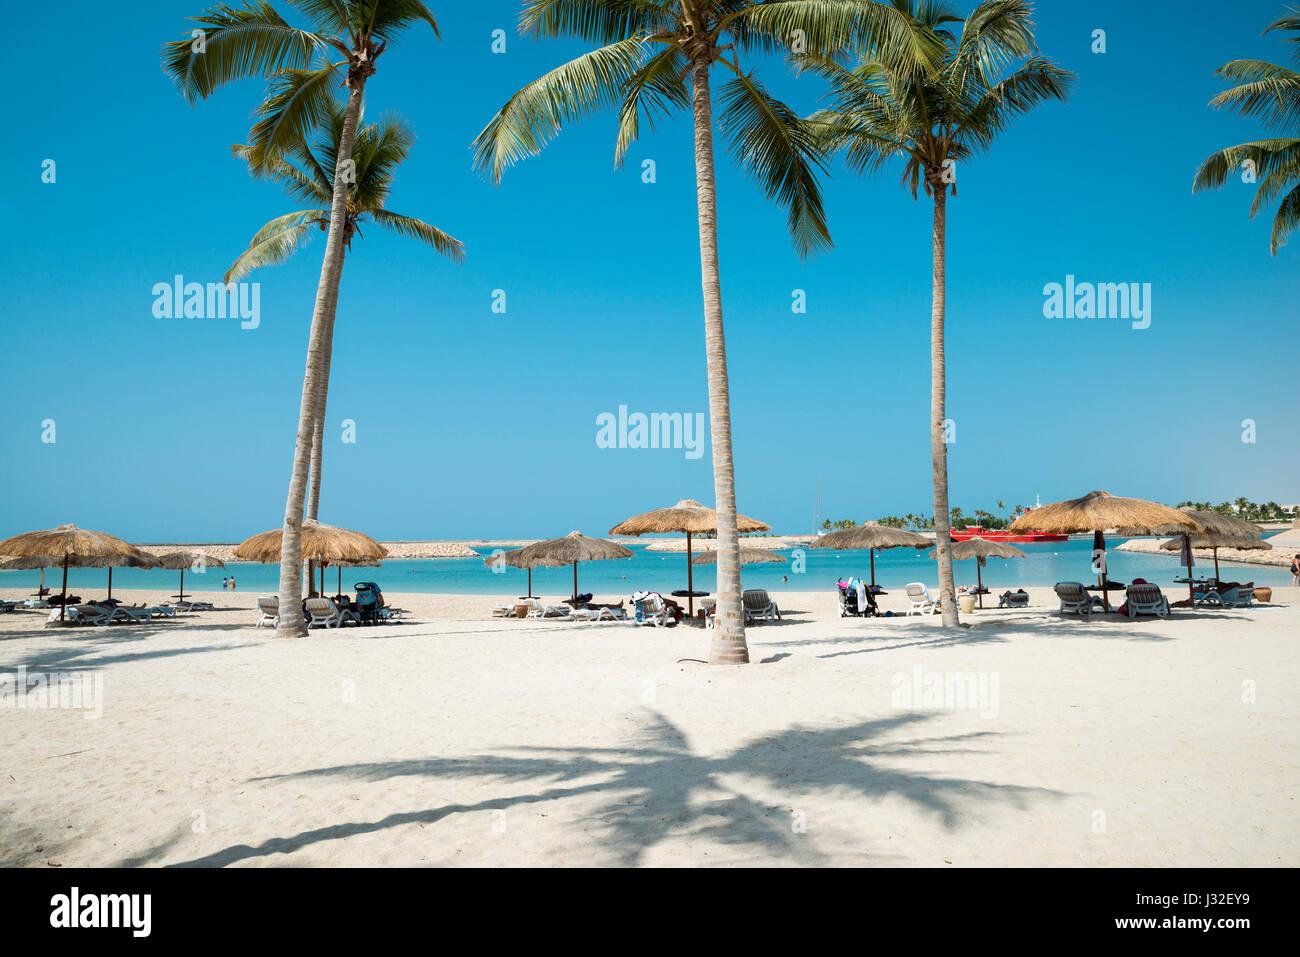 Hotel Al Fanar Salalah Dhofar Governorate Oman Stockfoto Bild